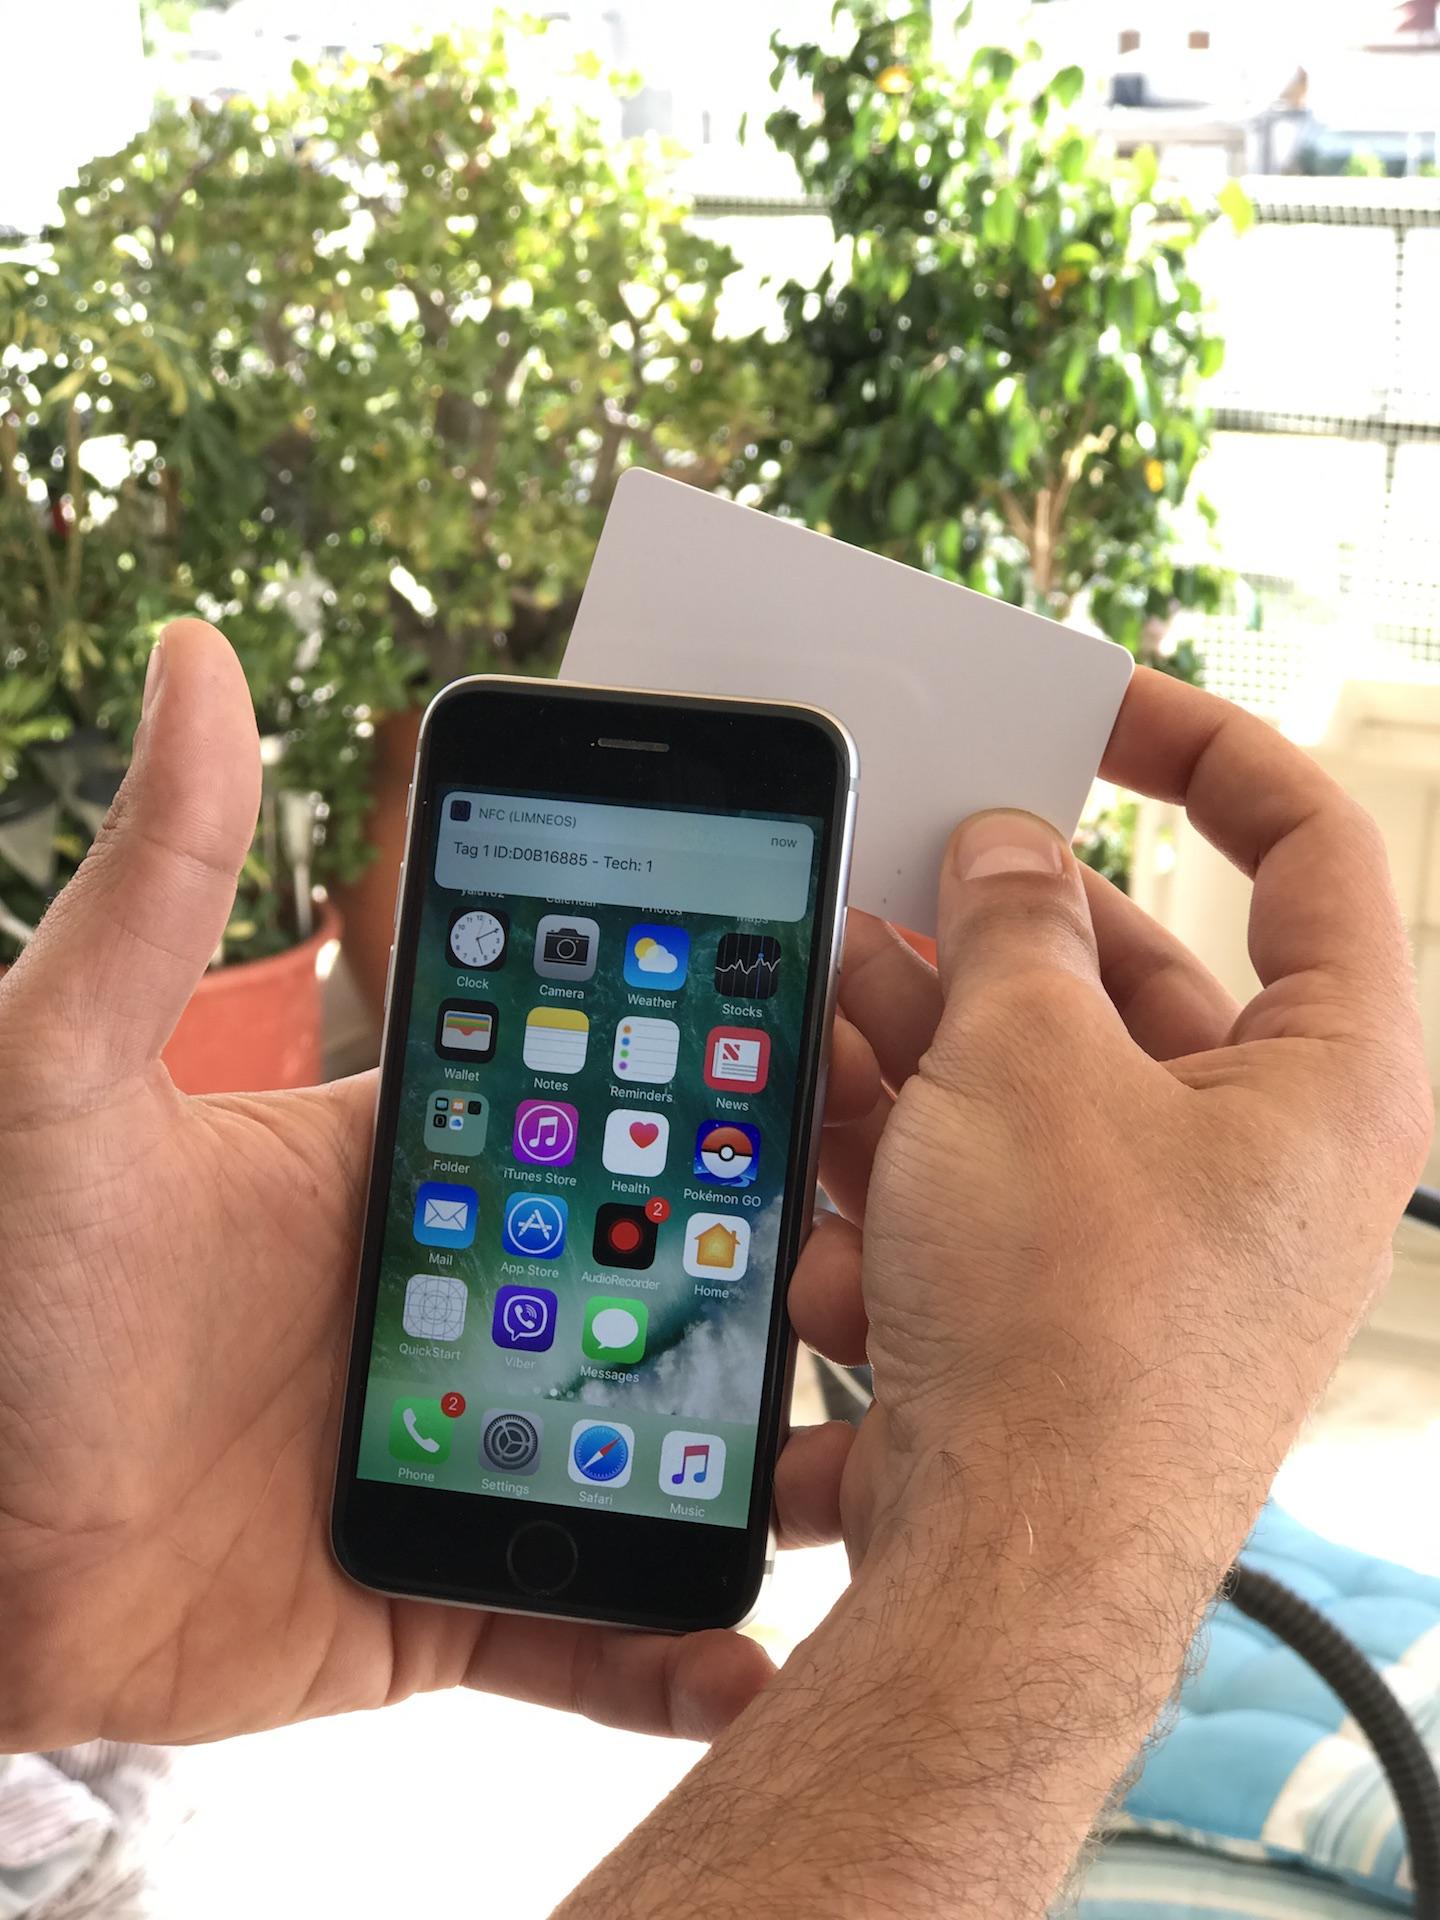 Jailbreak developer hacks NFC on iPhone 6s to talk to NFC